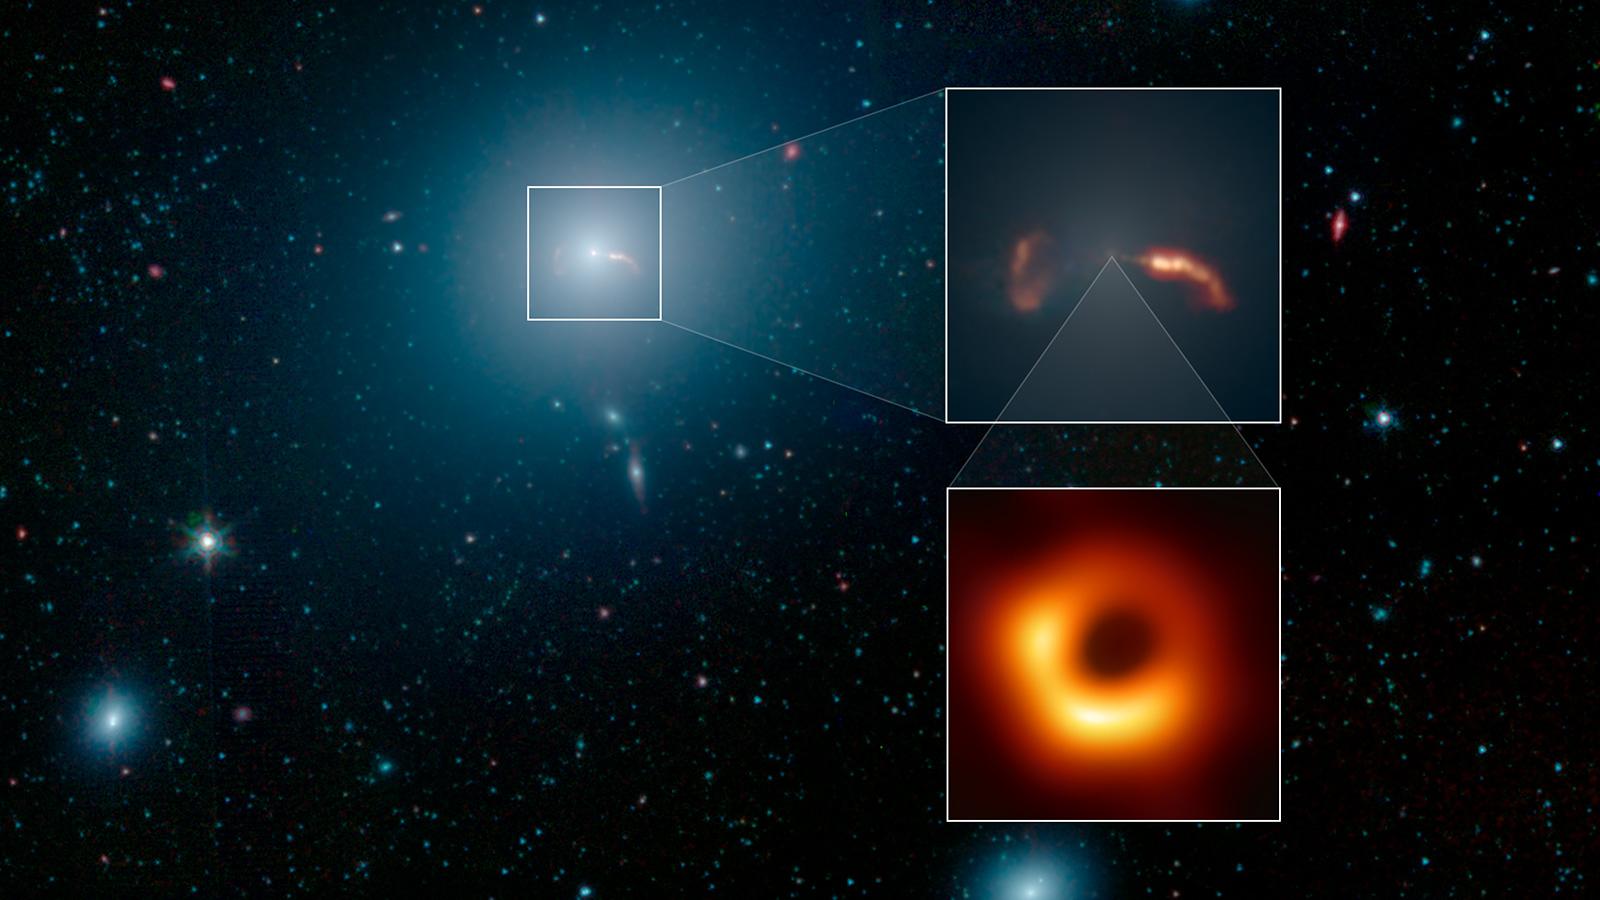 星系、噴流、kah 有名 ê 烏洞 ft. 蔡老師 (20210415)